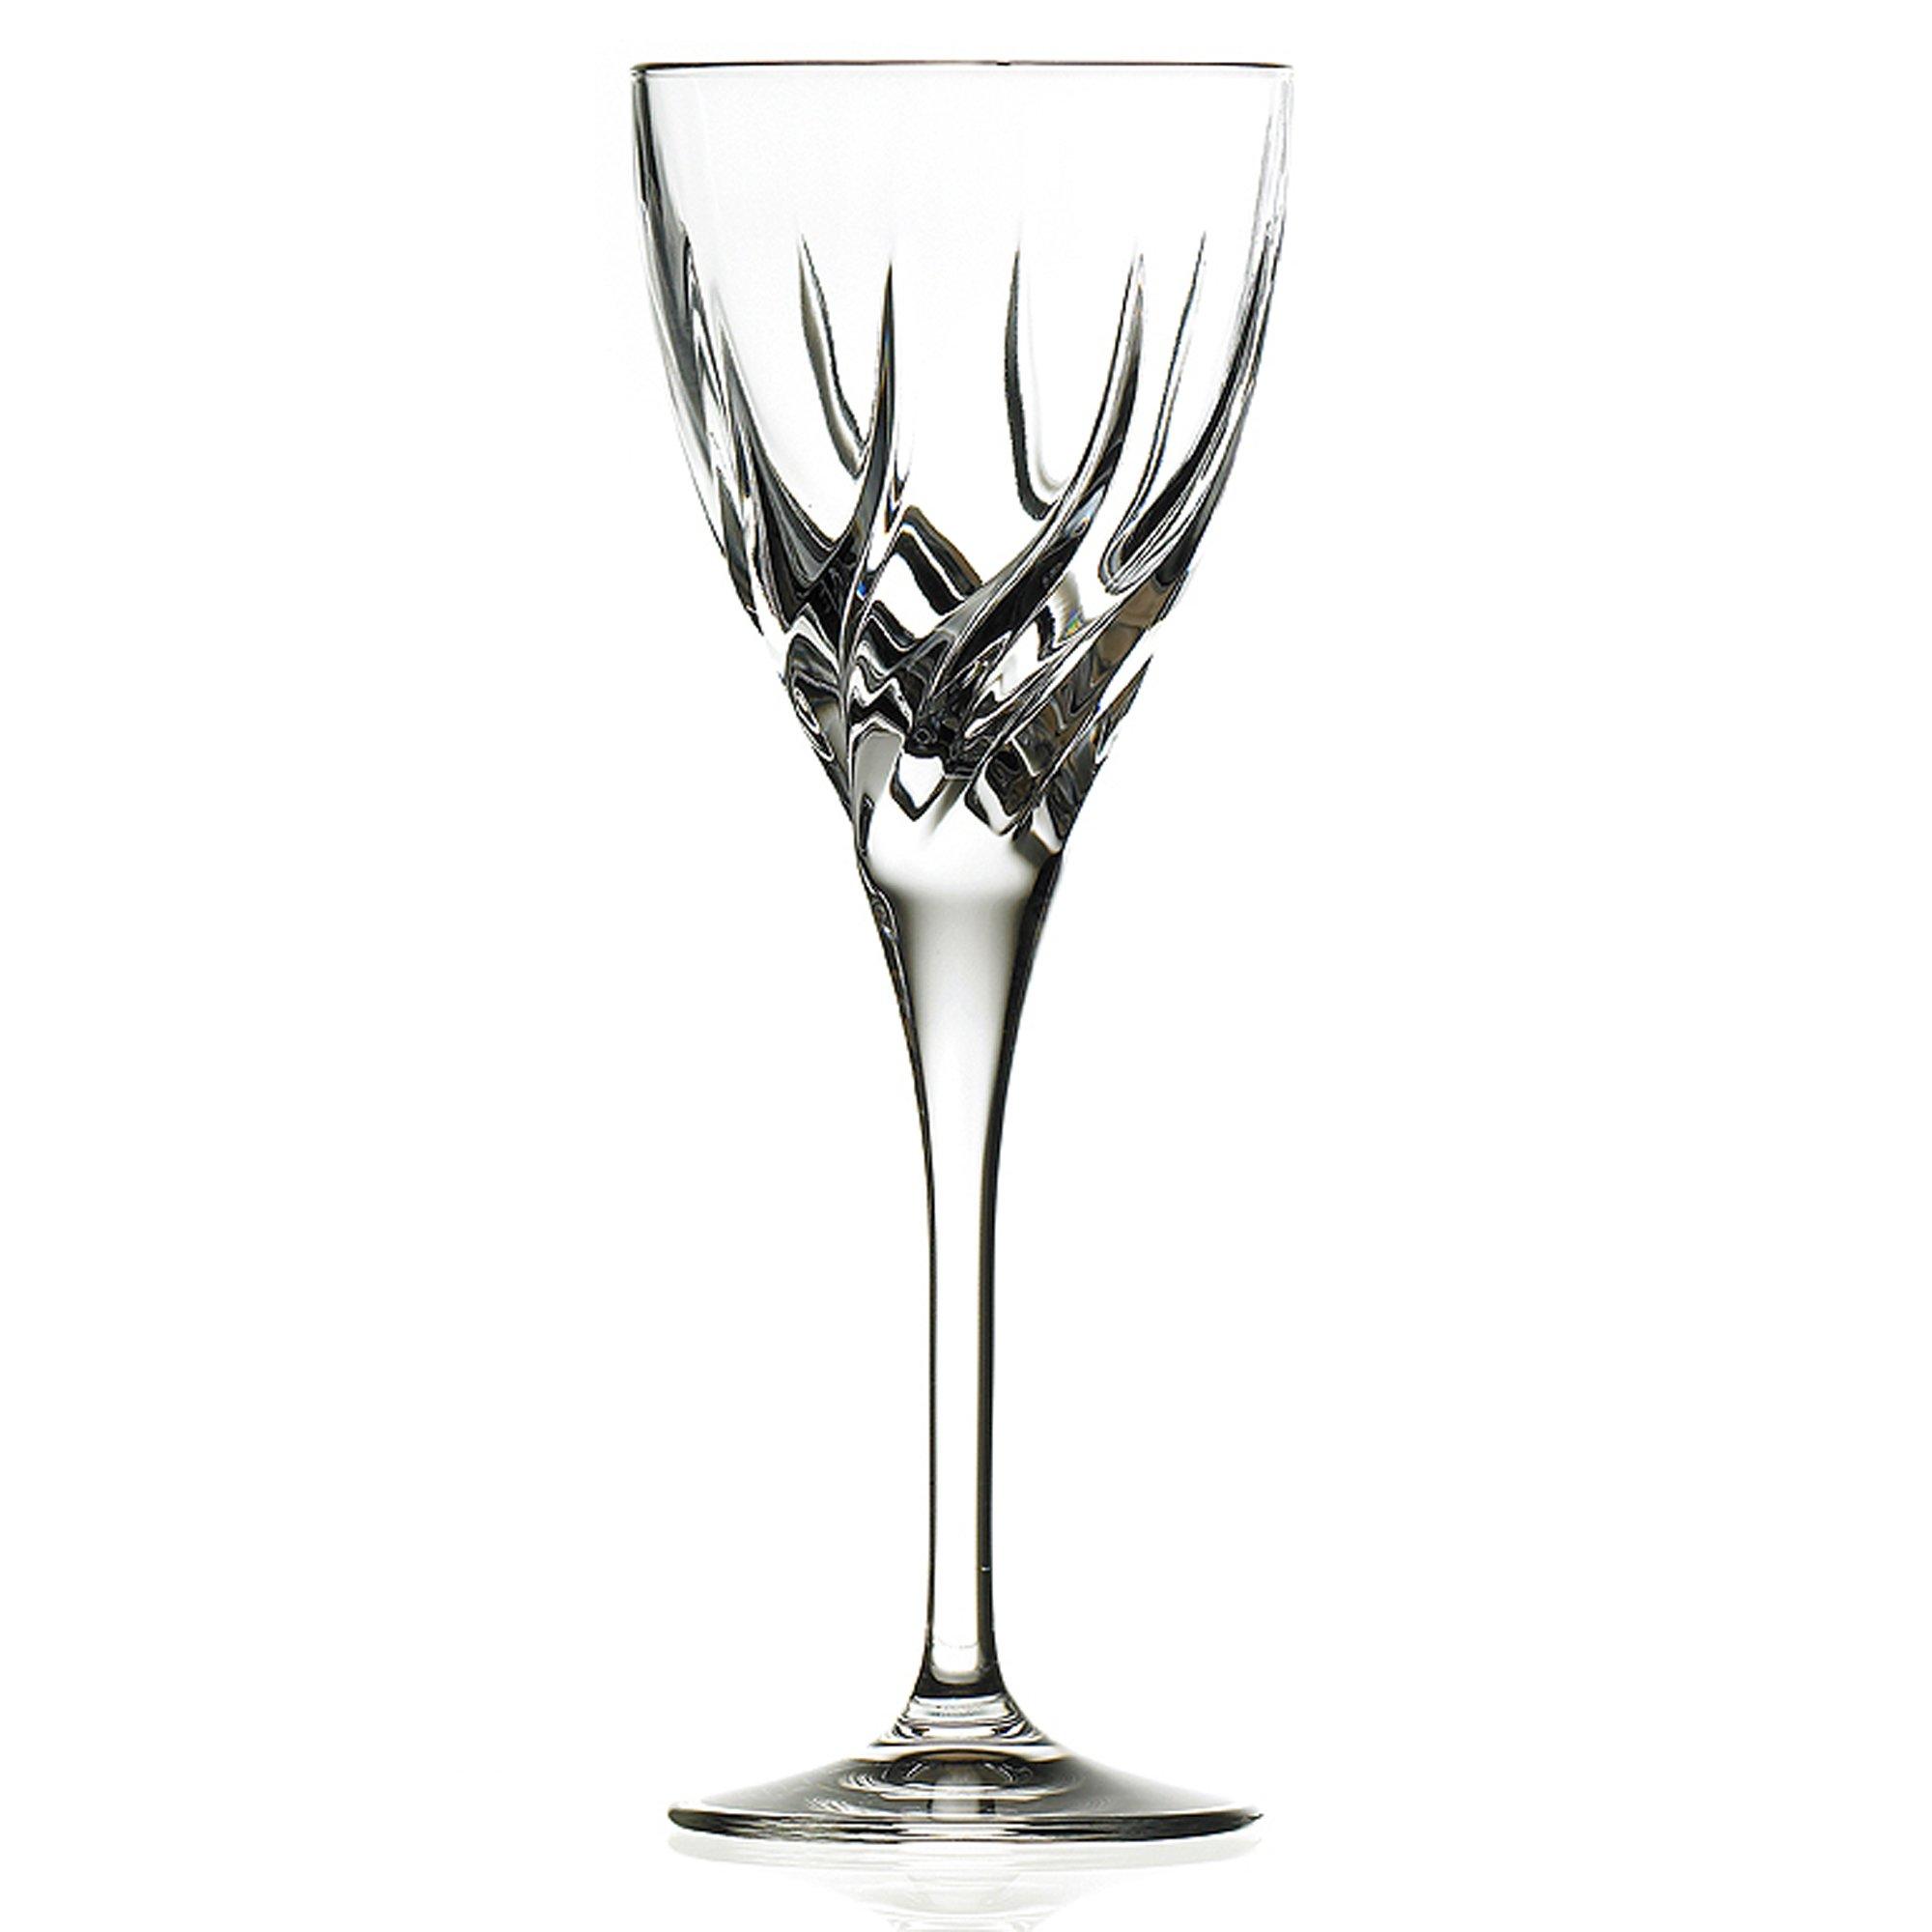 Lorenzo Rcr Crystal Trix Collection Wine Glasses, Set of 6